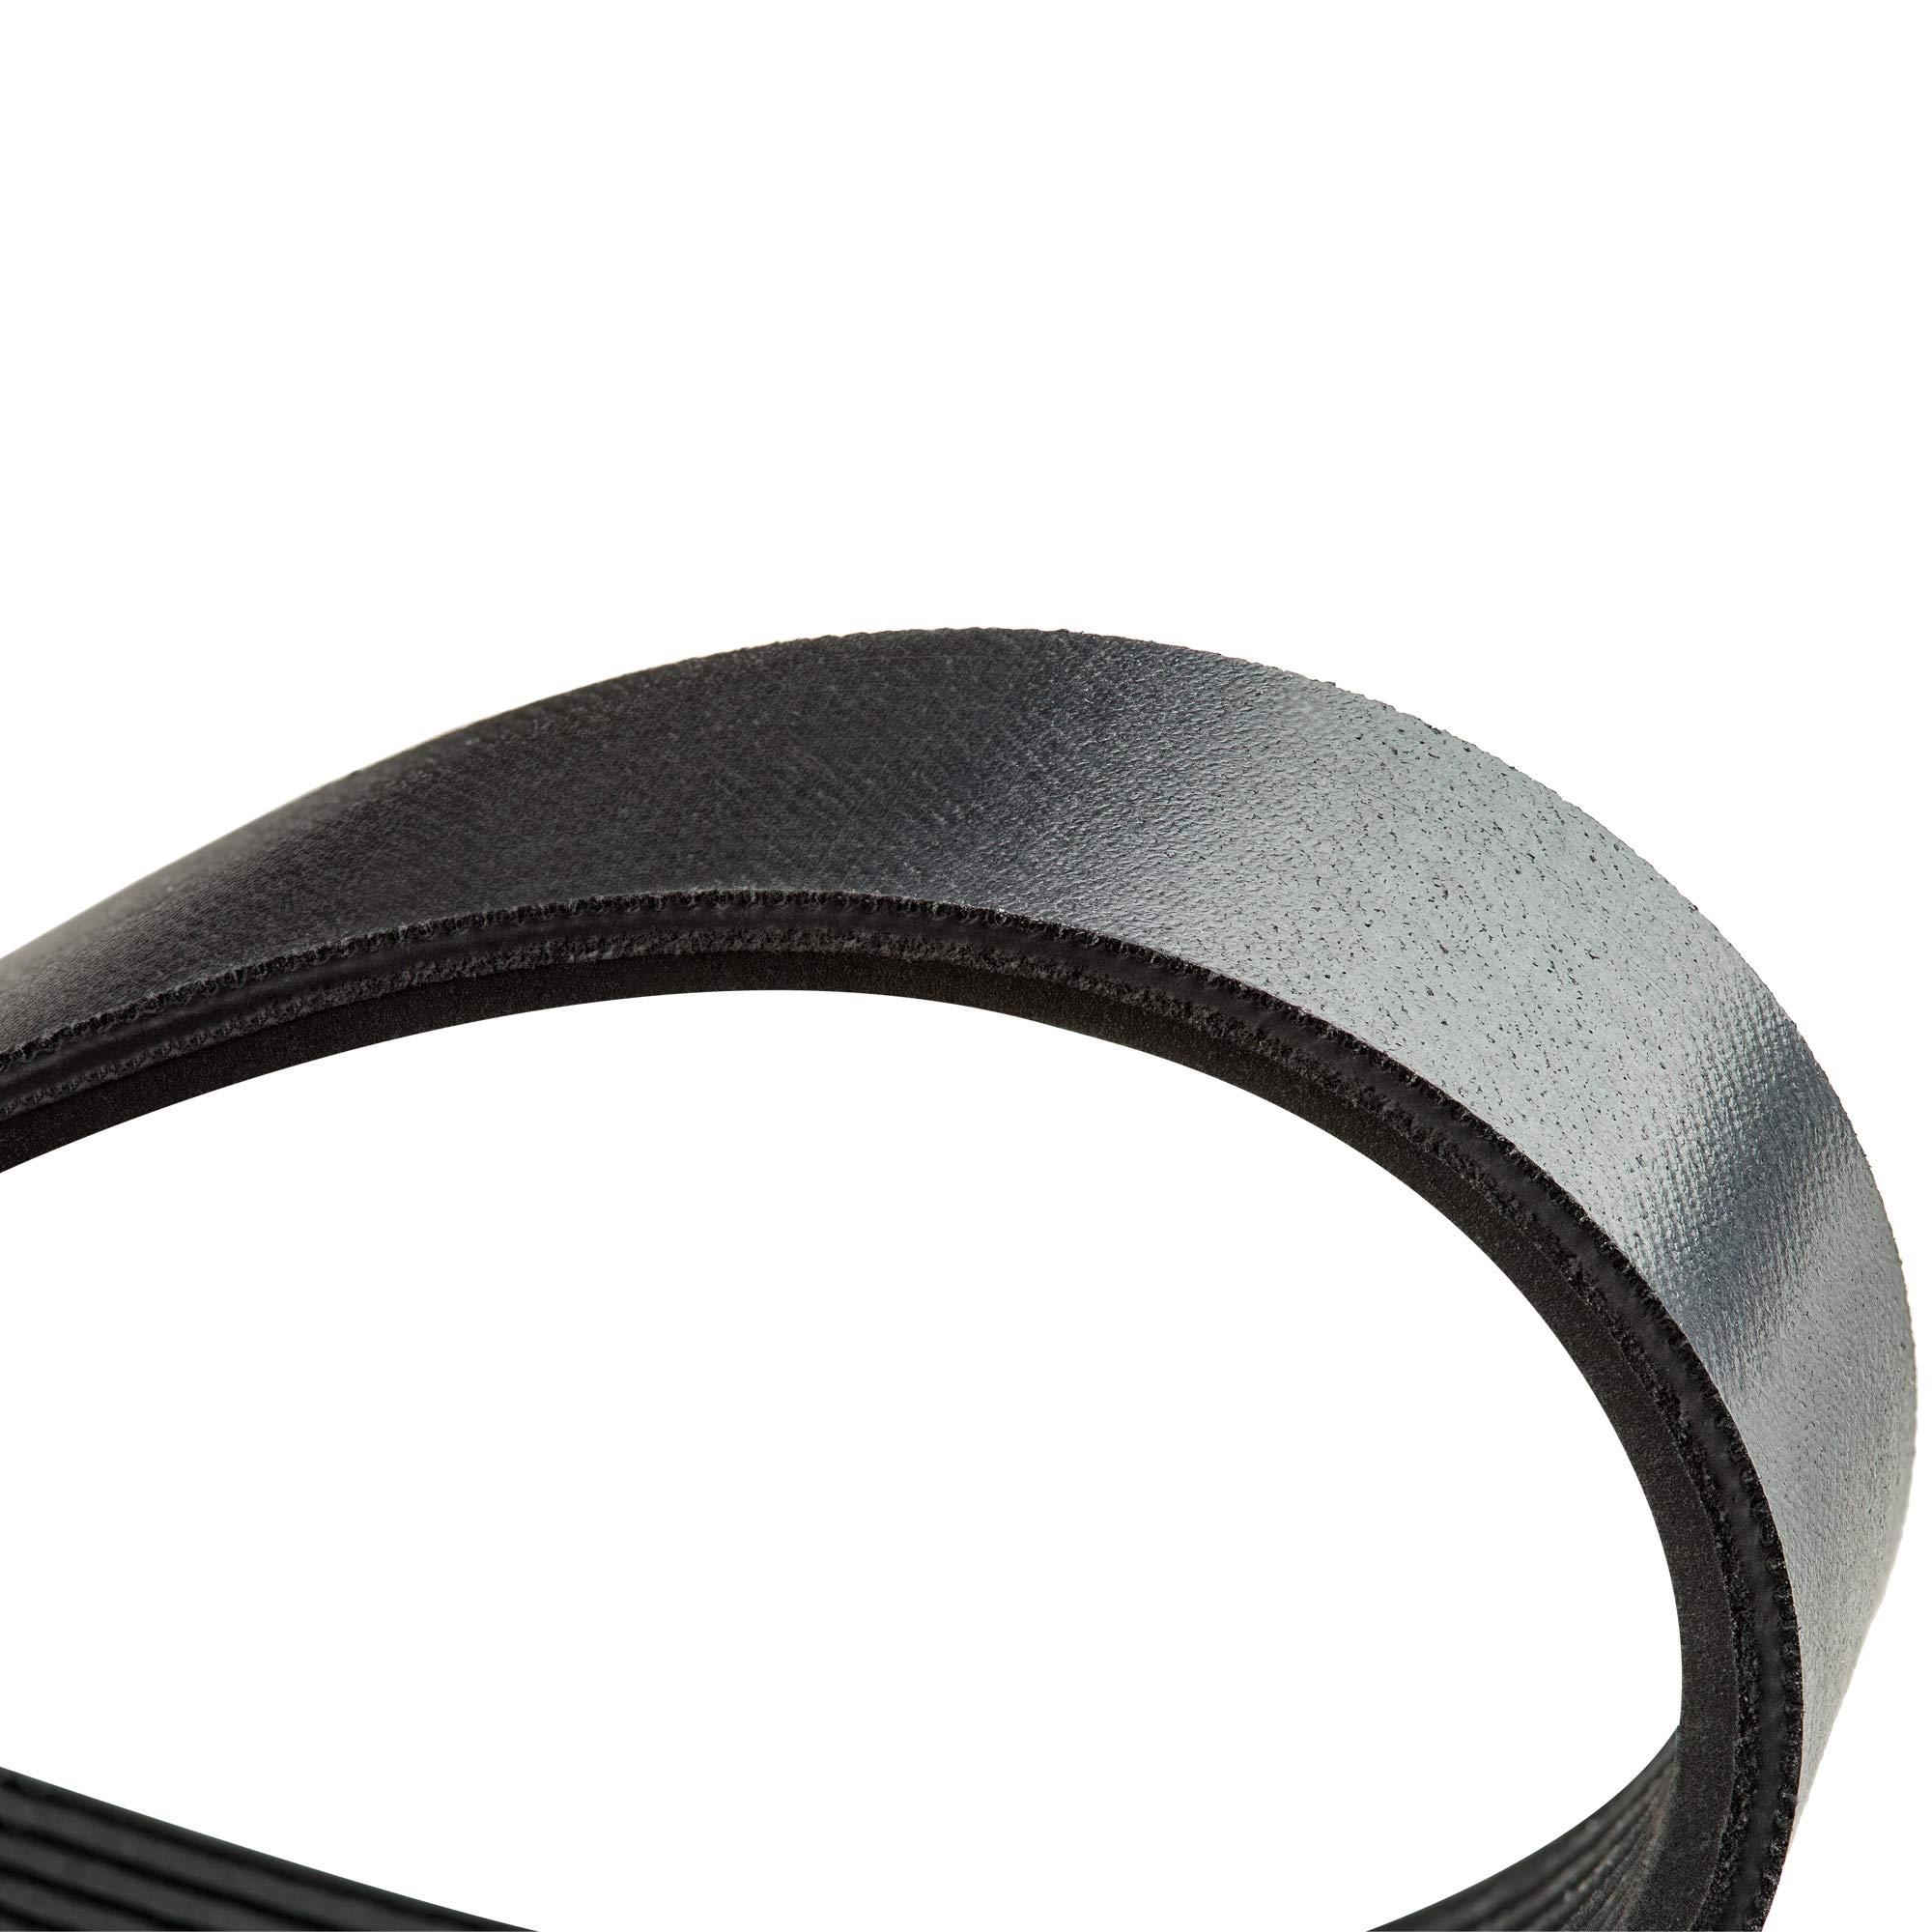 Black rubber speed control Drive Drive Belt 49/Teeth 10/mm Width 98XL